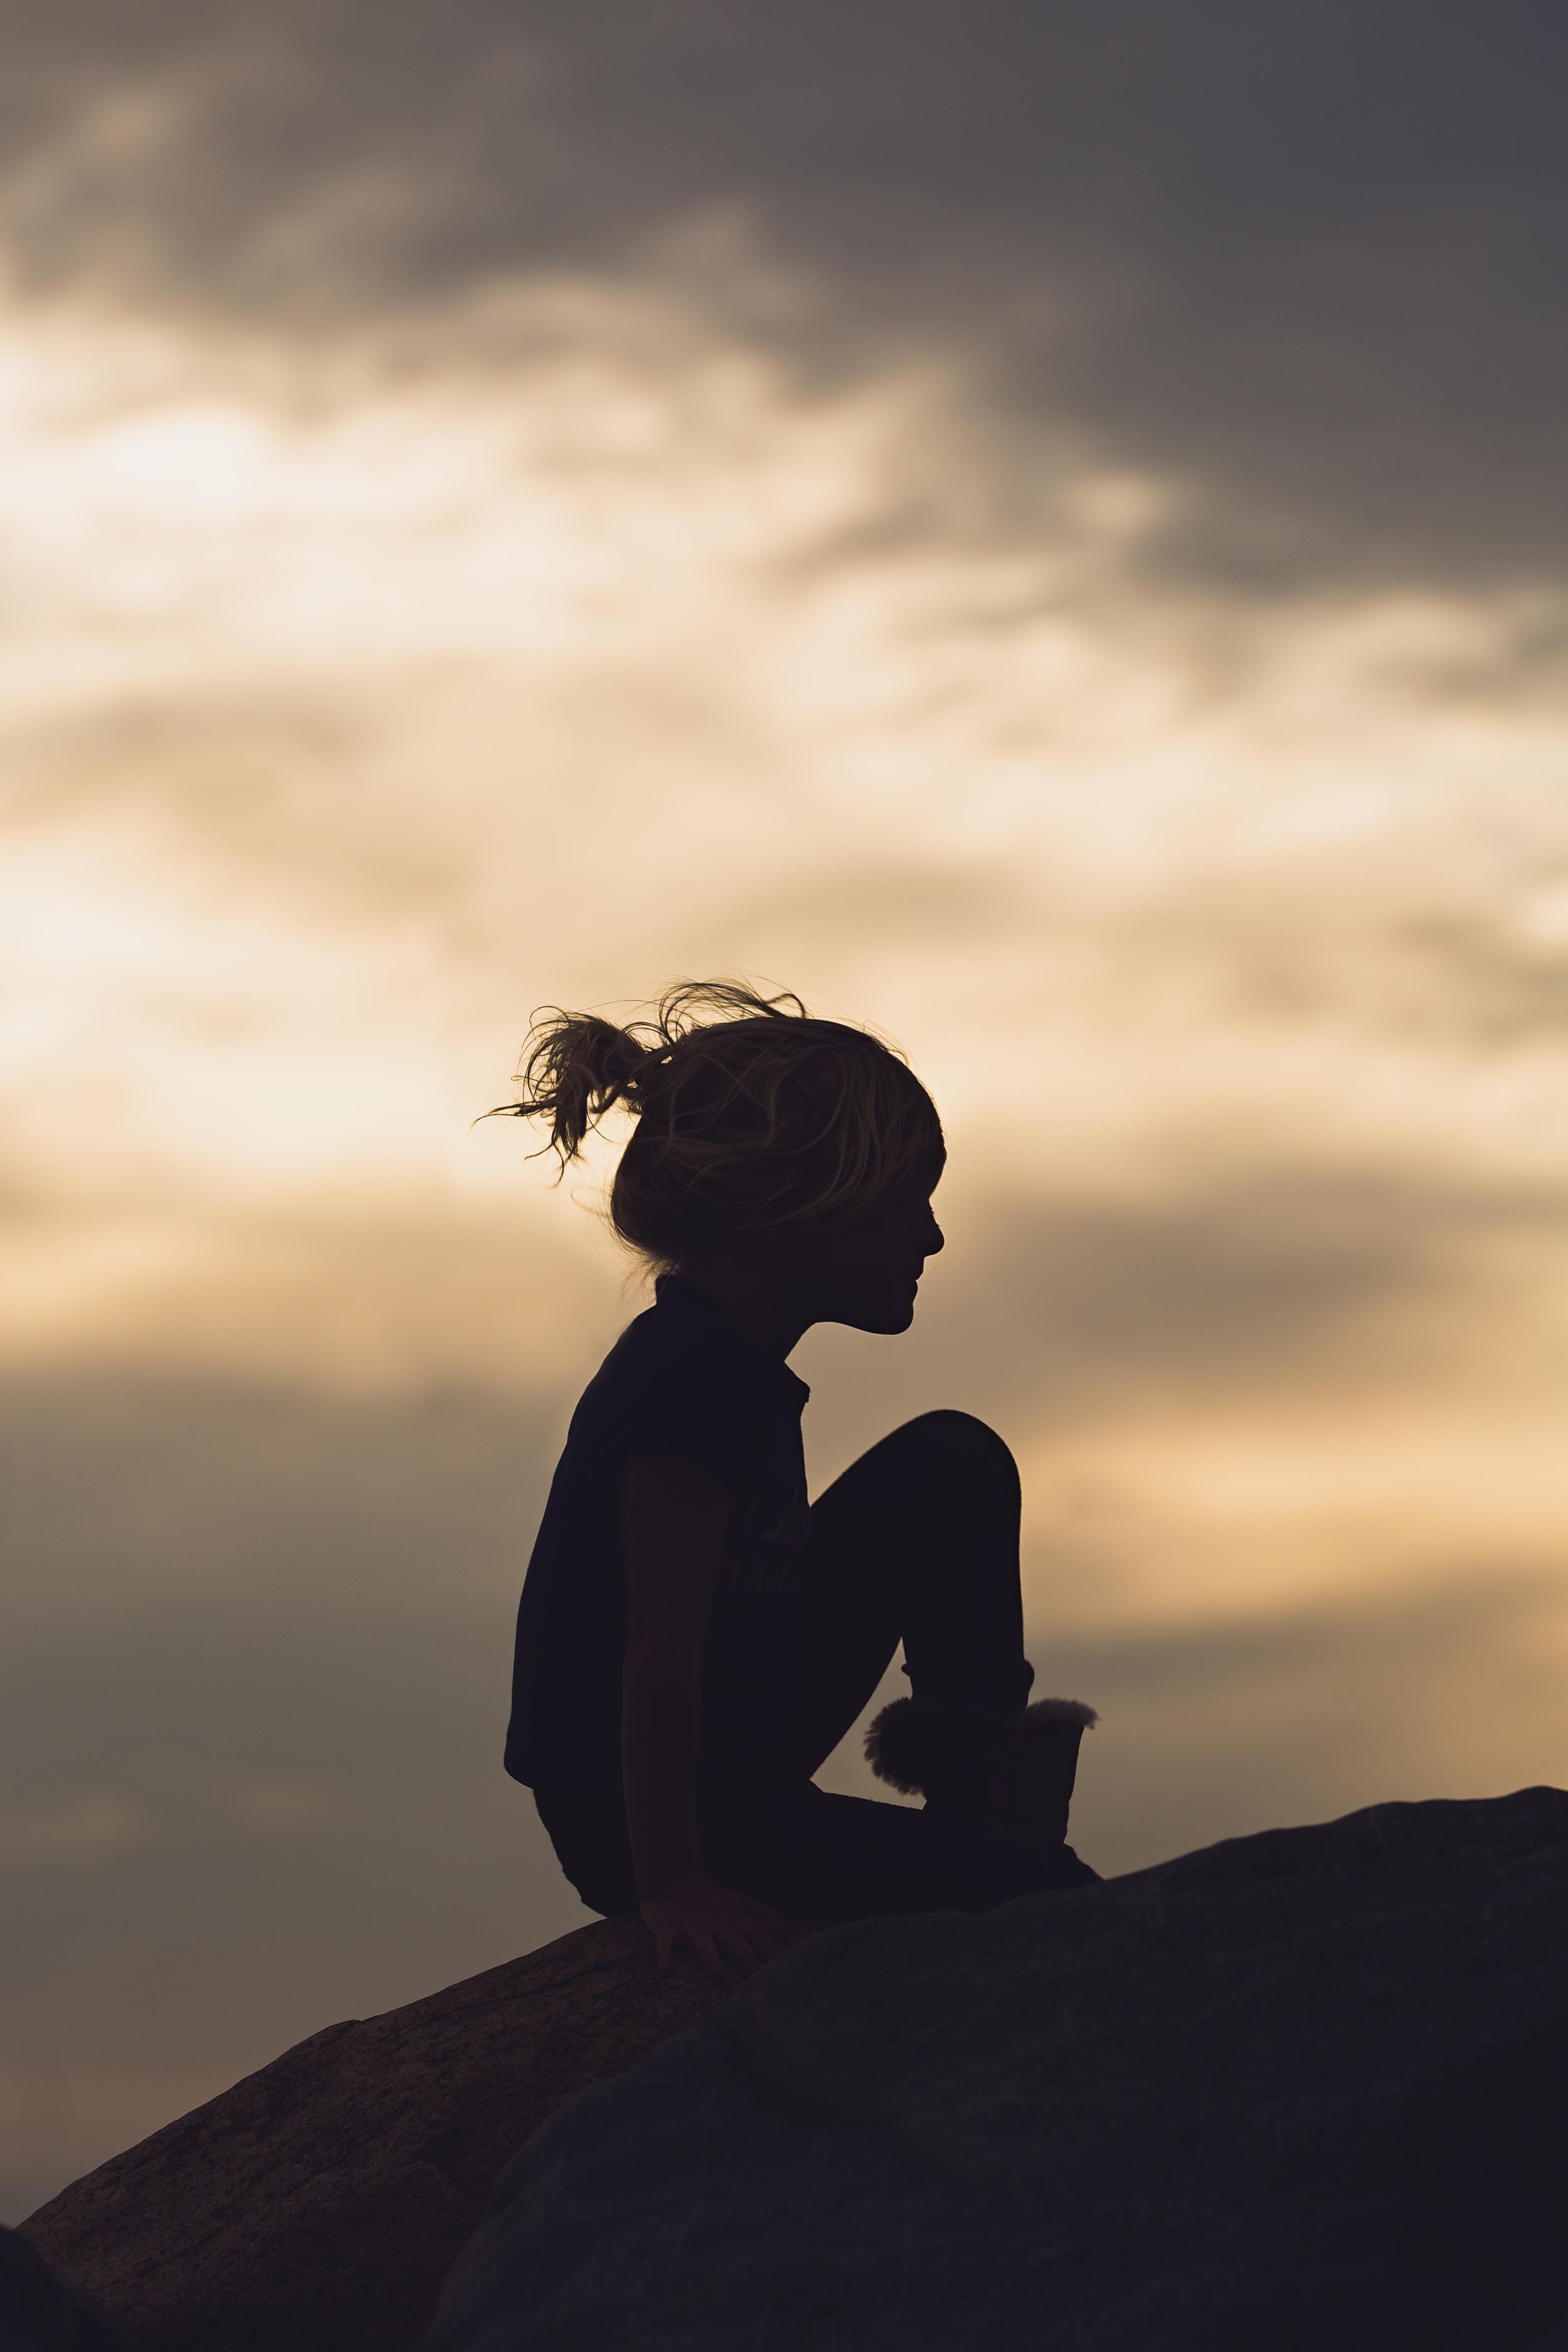 Long-Island-family-photographer-hello-olivia-photography-silhouette-sunset-2.jpg